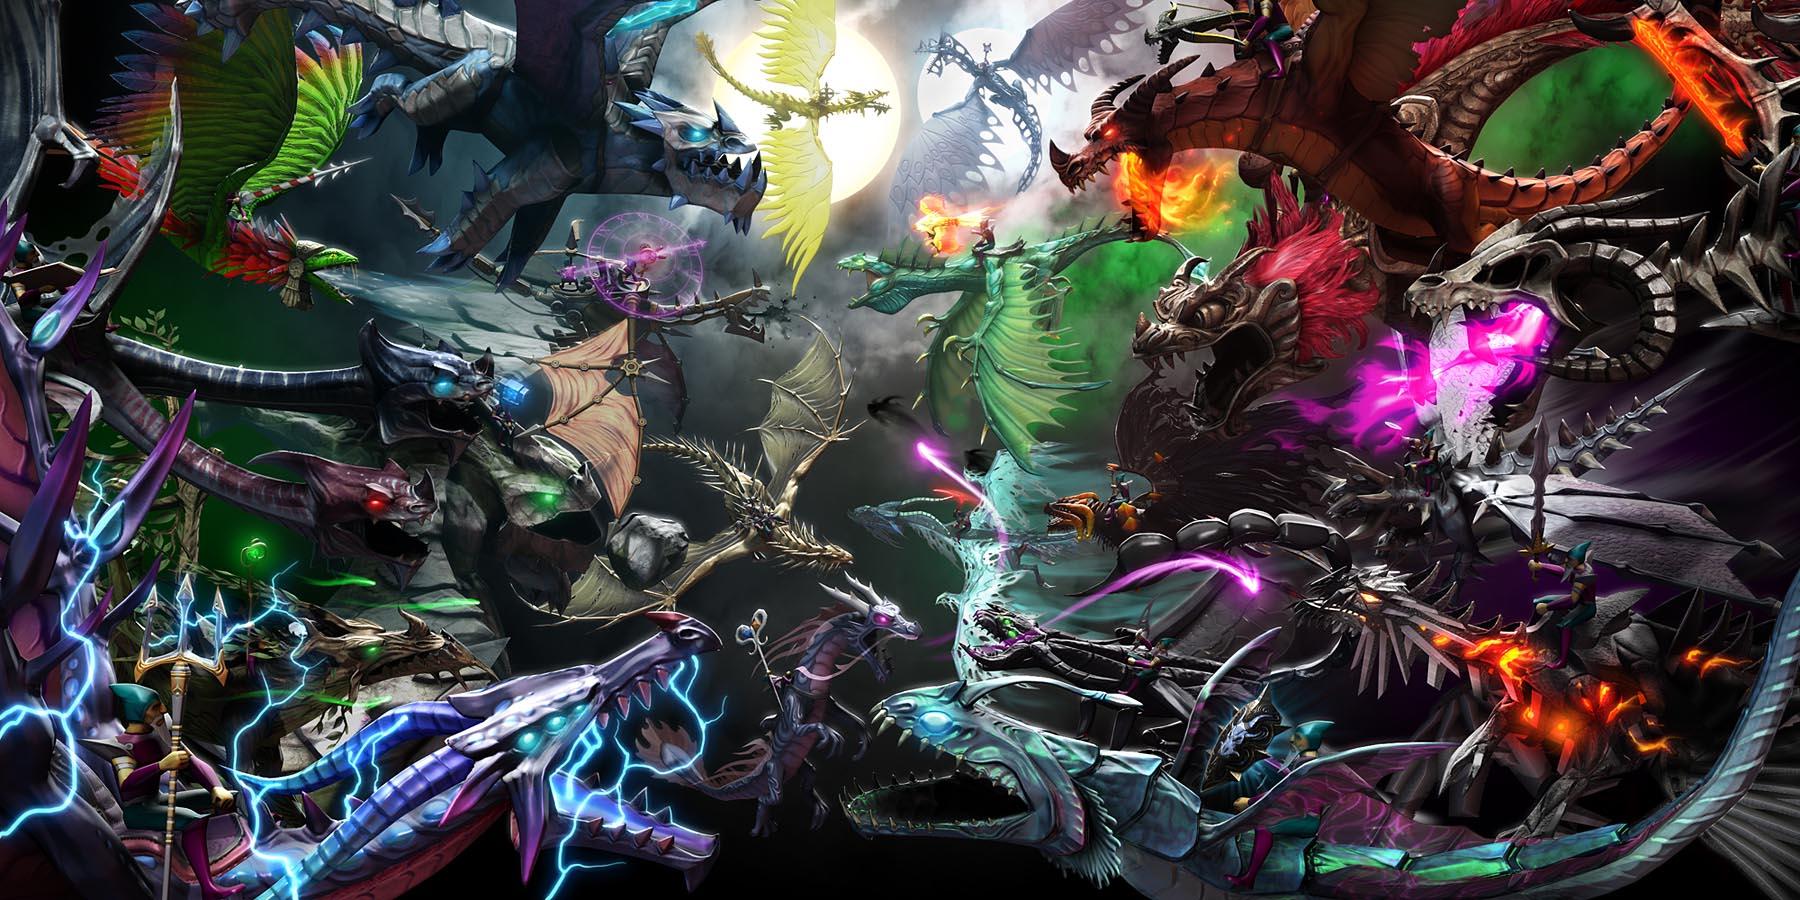 Chinese Dragon Wallpaper Hd Dragons And Titans Windows Mac Web Mobile Ios Ipad